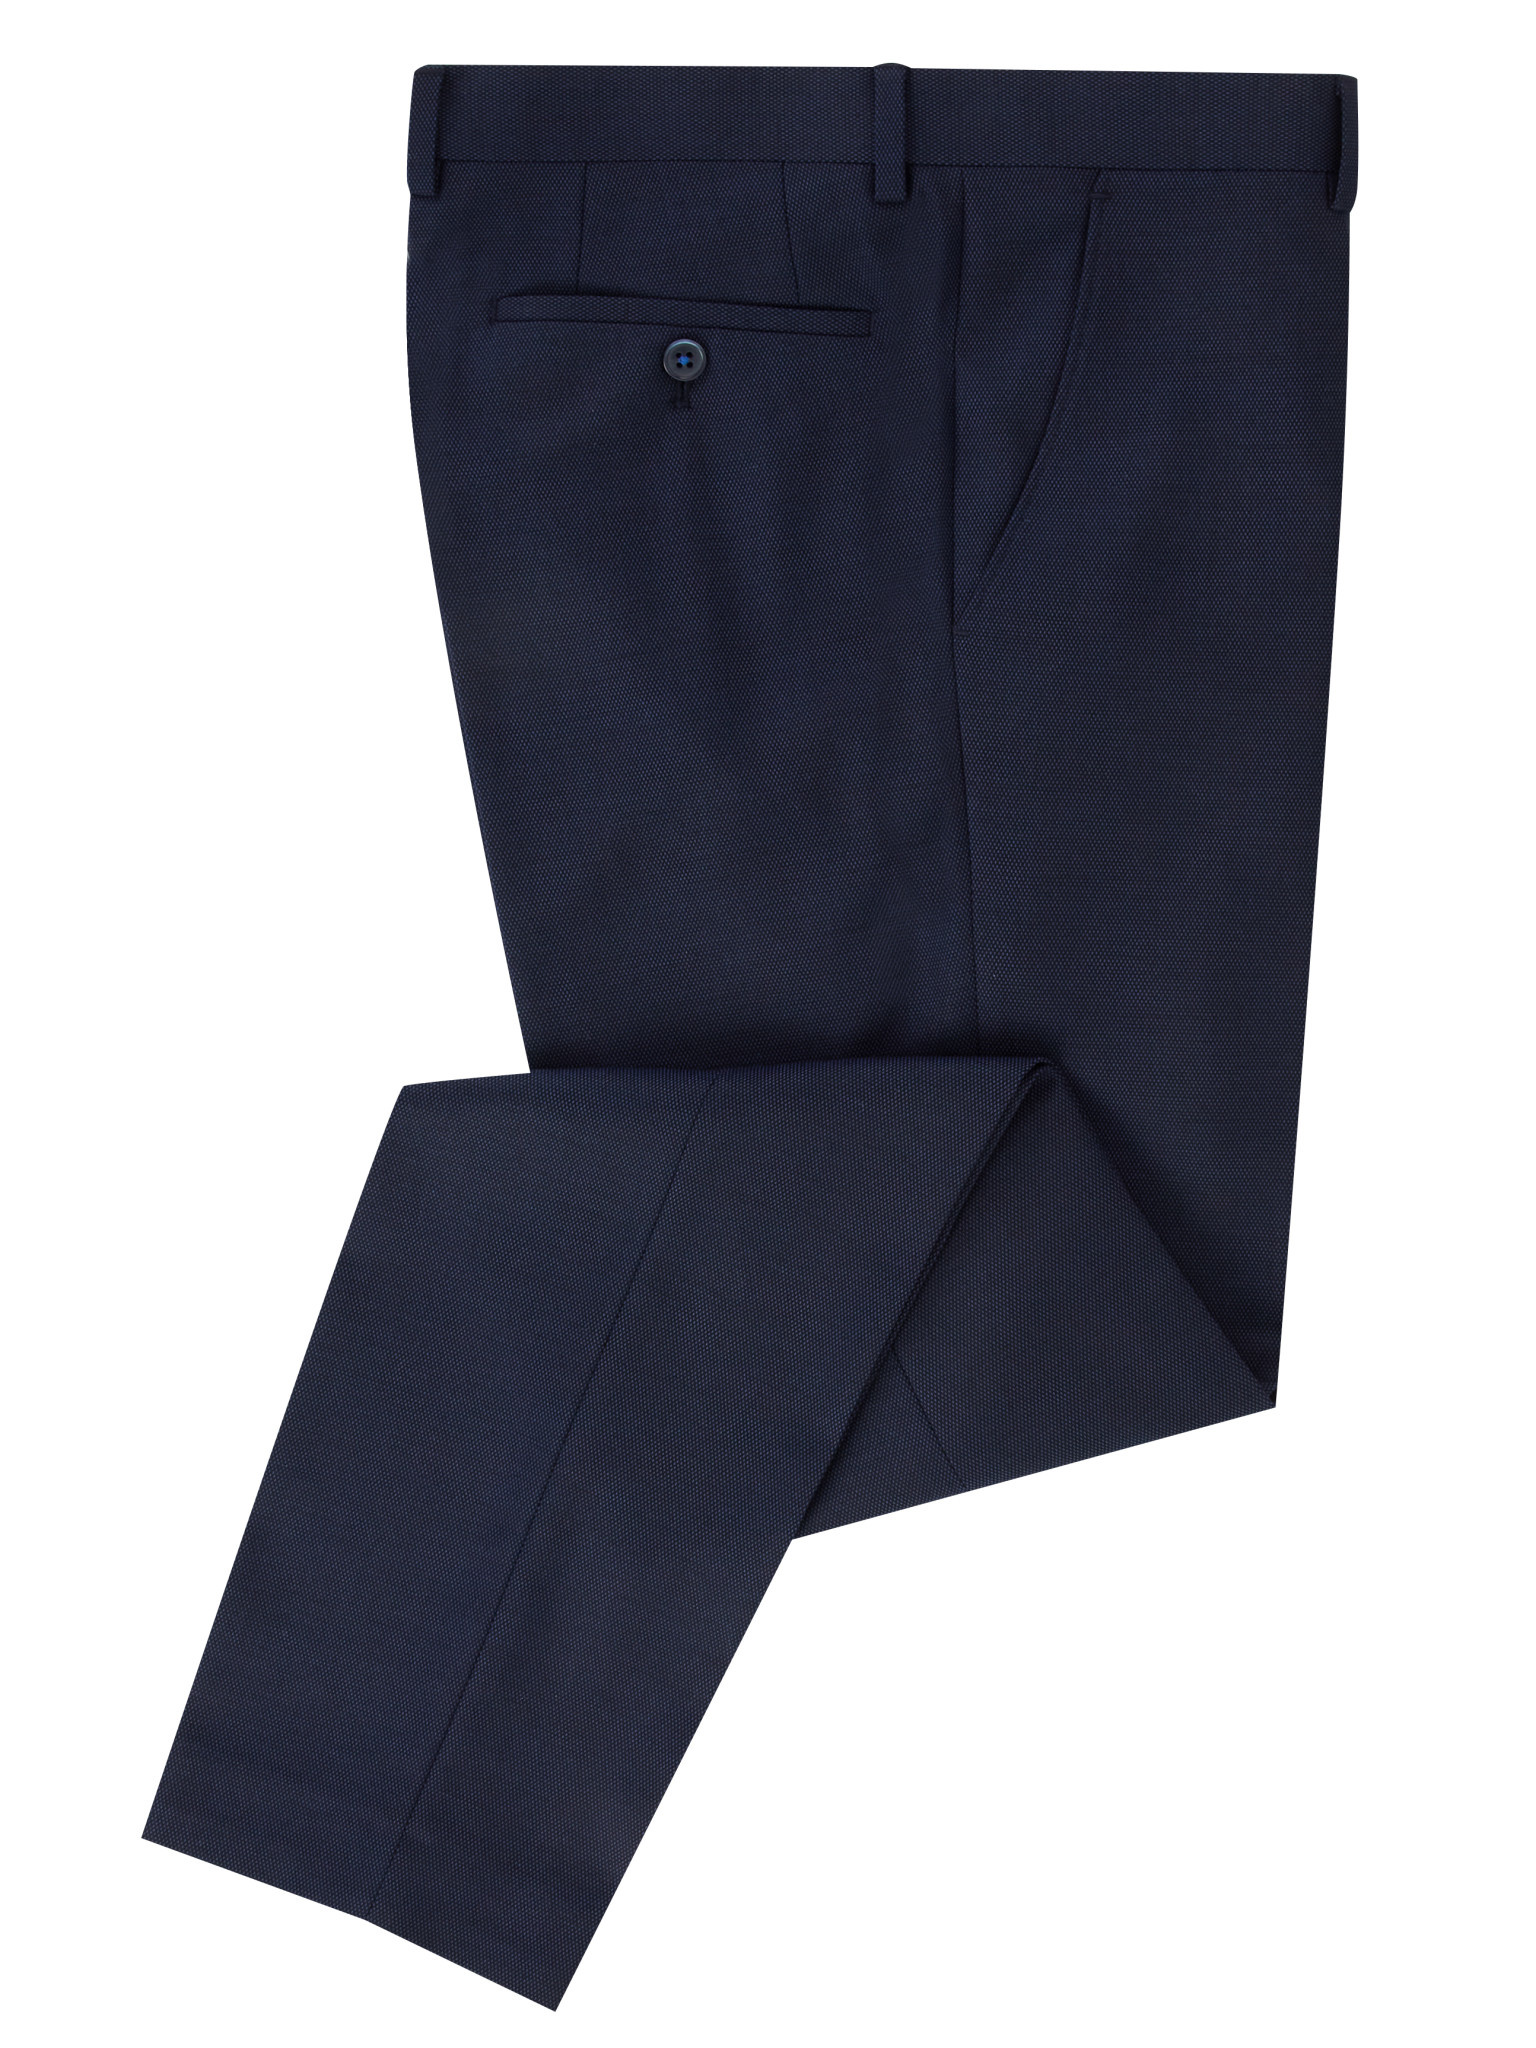 Remus Uomo Navy Blue x-slim